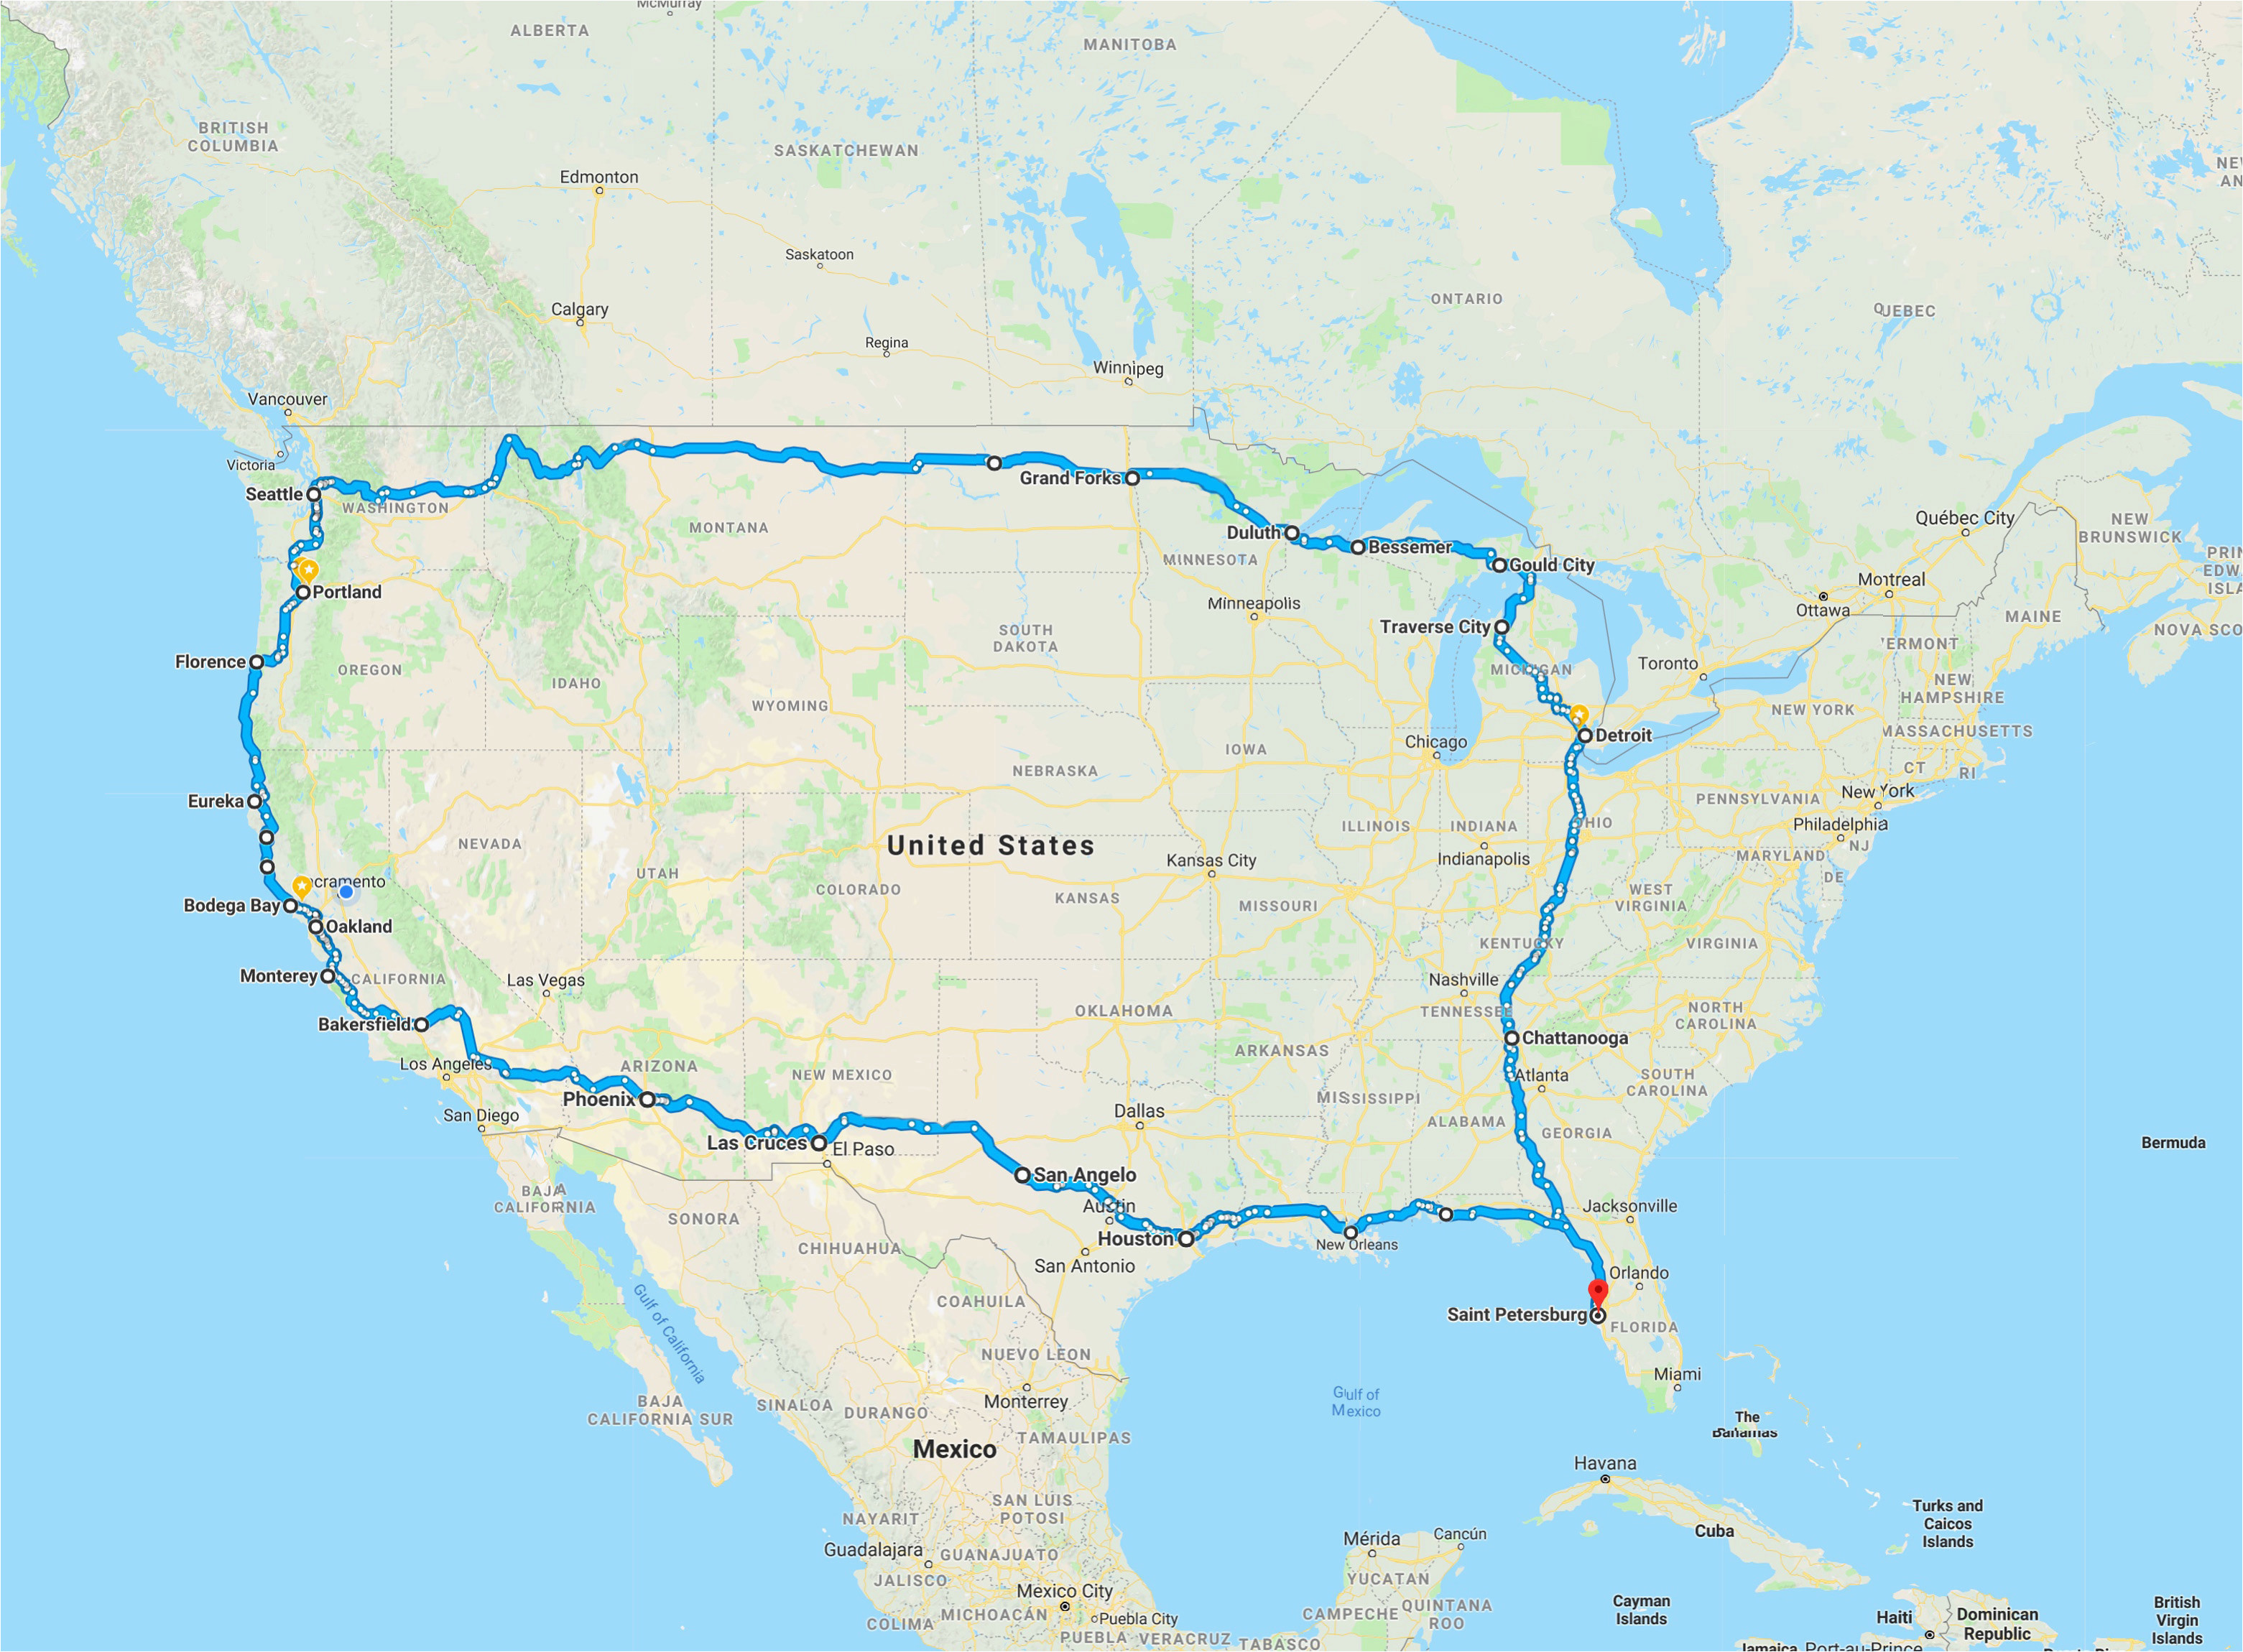 la paz mexico map inspirational baja california peninsula maps